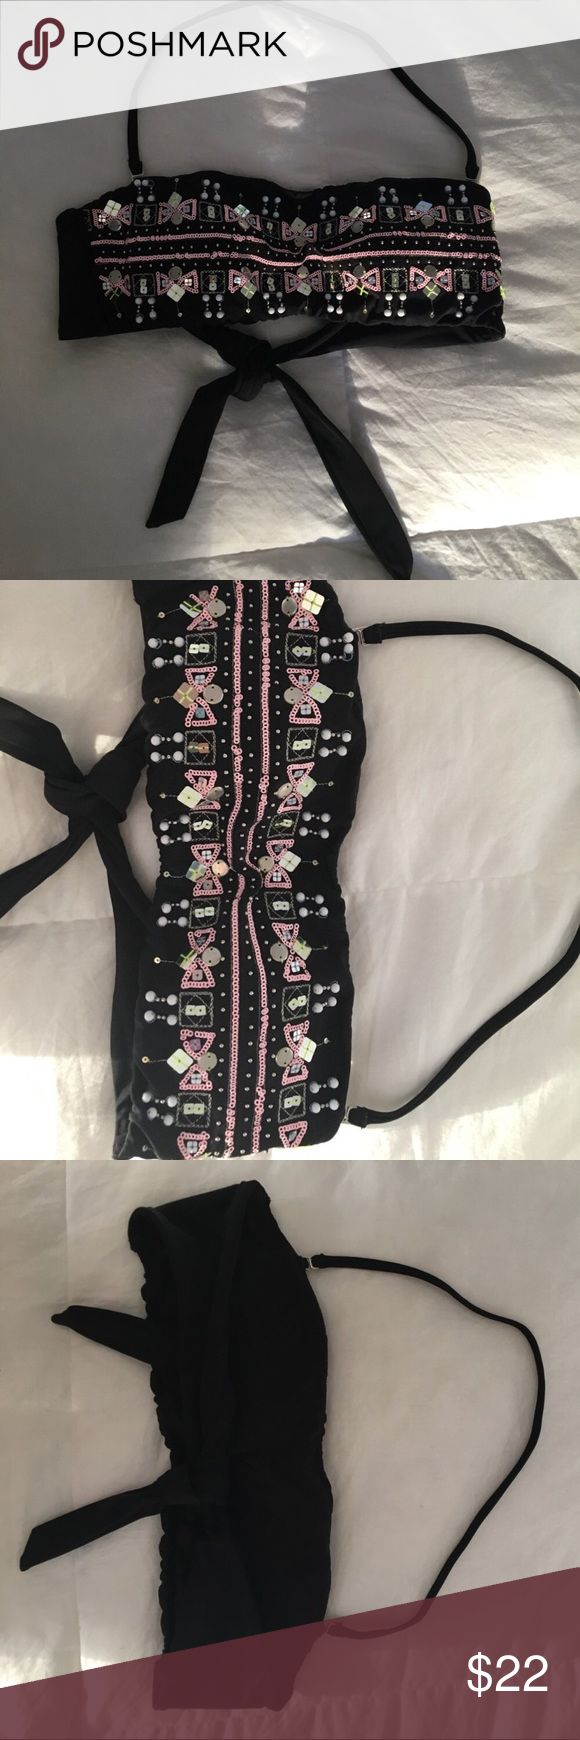 Victoria's Secret VS swim bandeau sequins top Super cute VS swim top. Never worn. No piling or missing sequins. Ties in the back.removable strap. Victoria's Secret Swim Bikinis